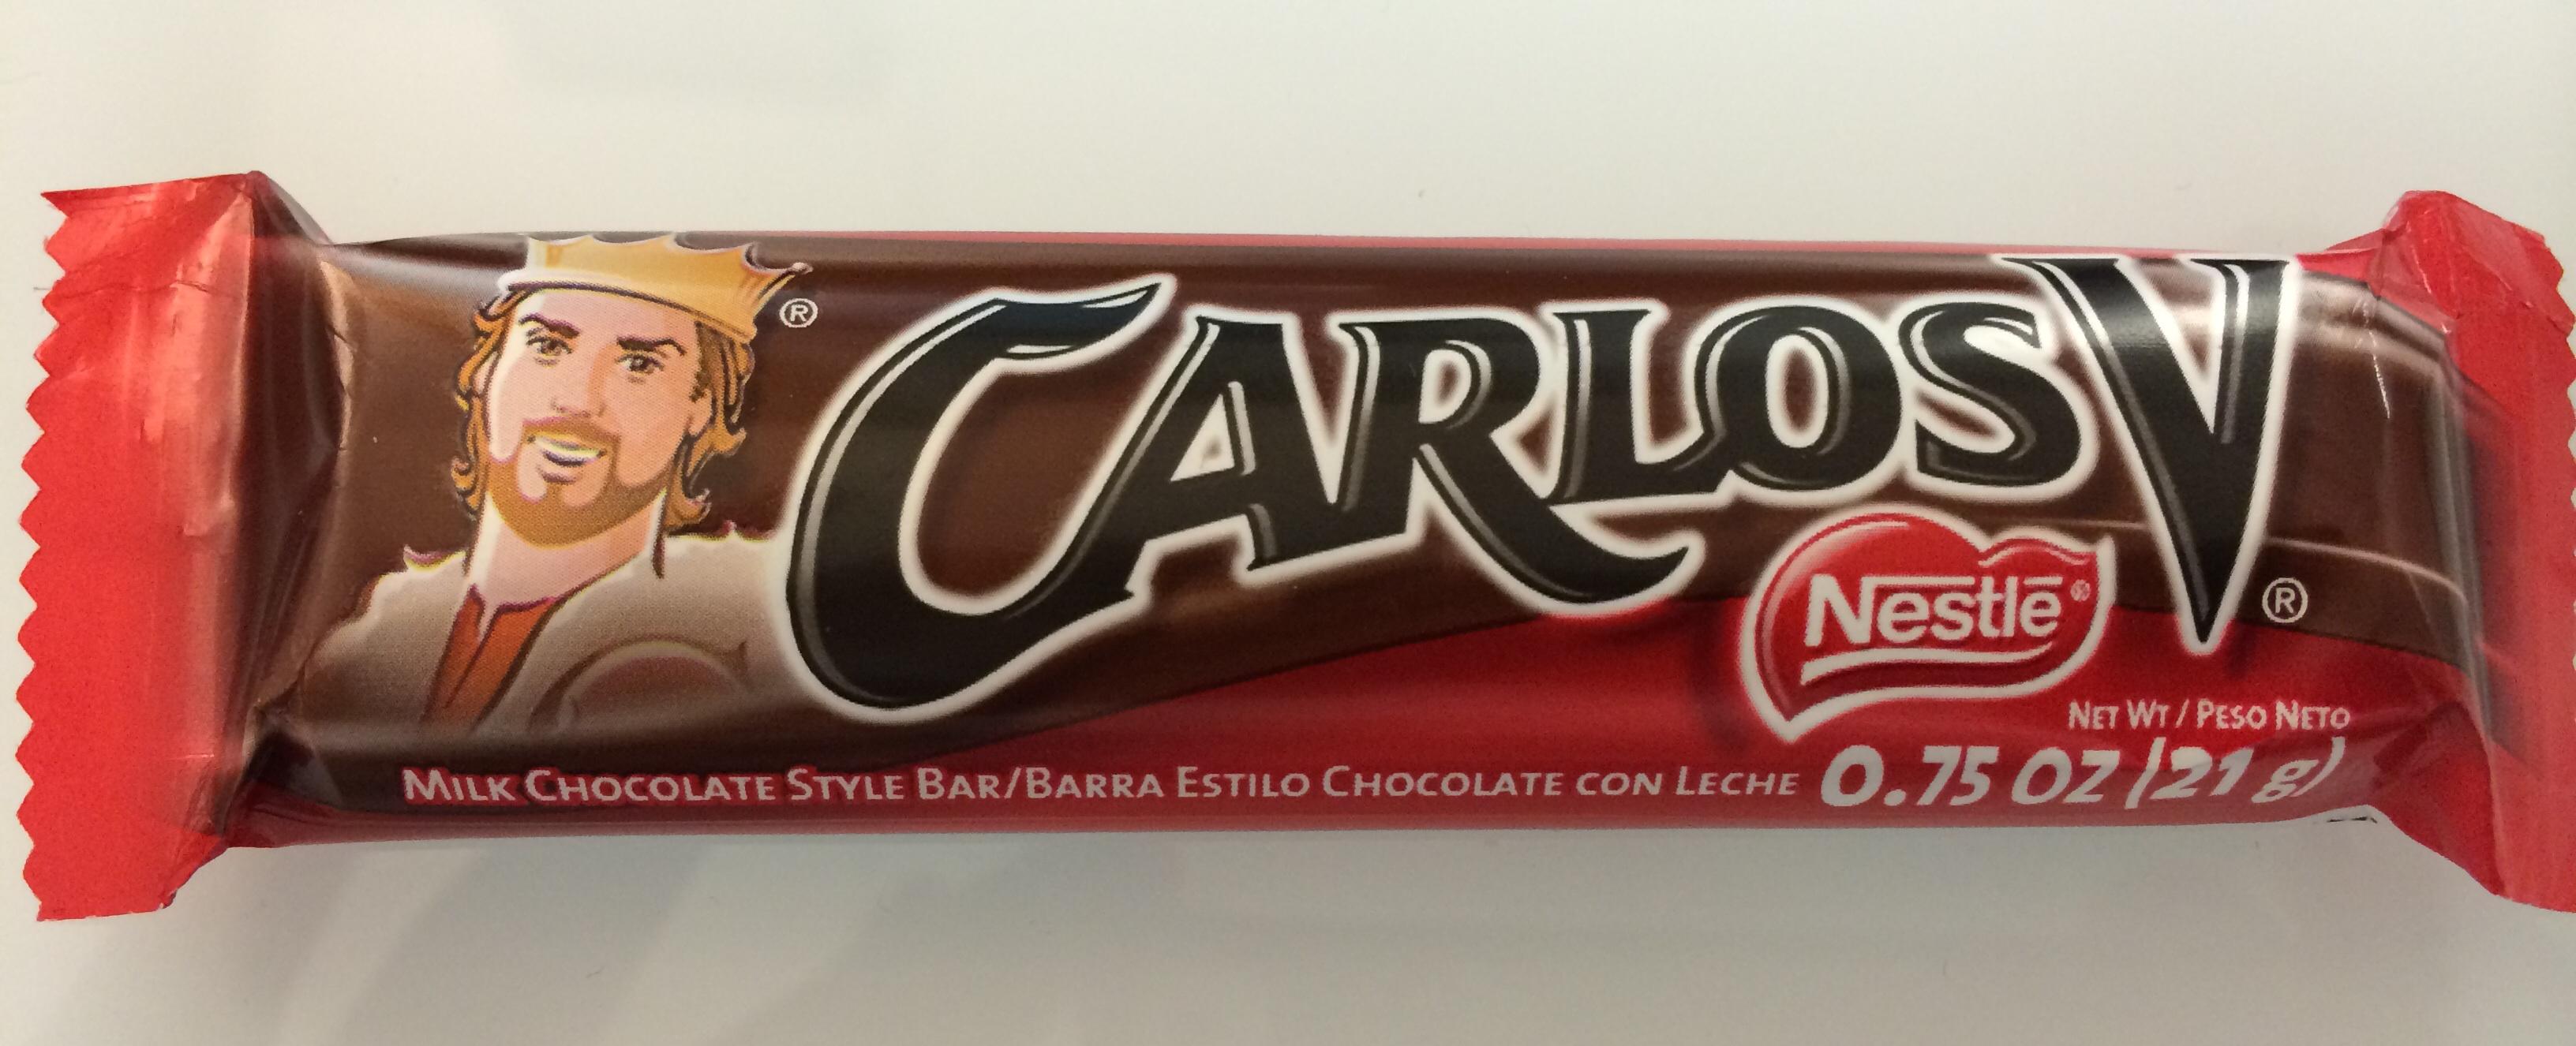 carlos v chocolate logo www pixshark com images shark fin logo shark fin theory domestic violence